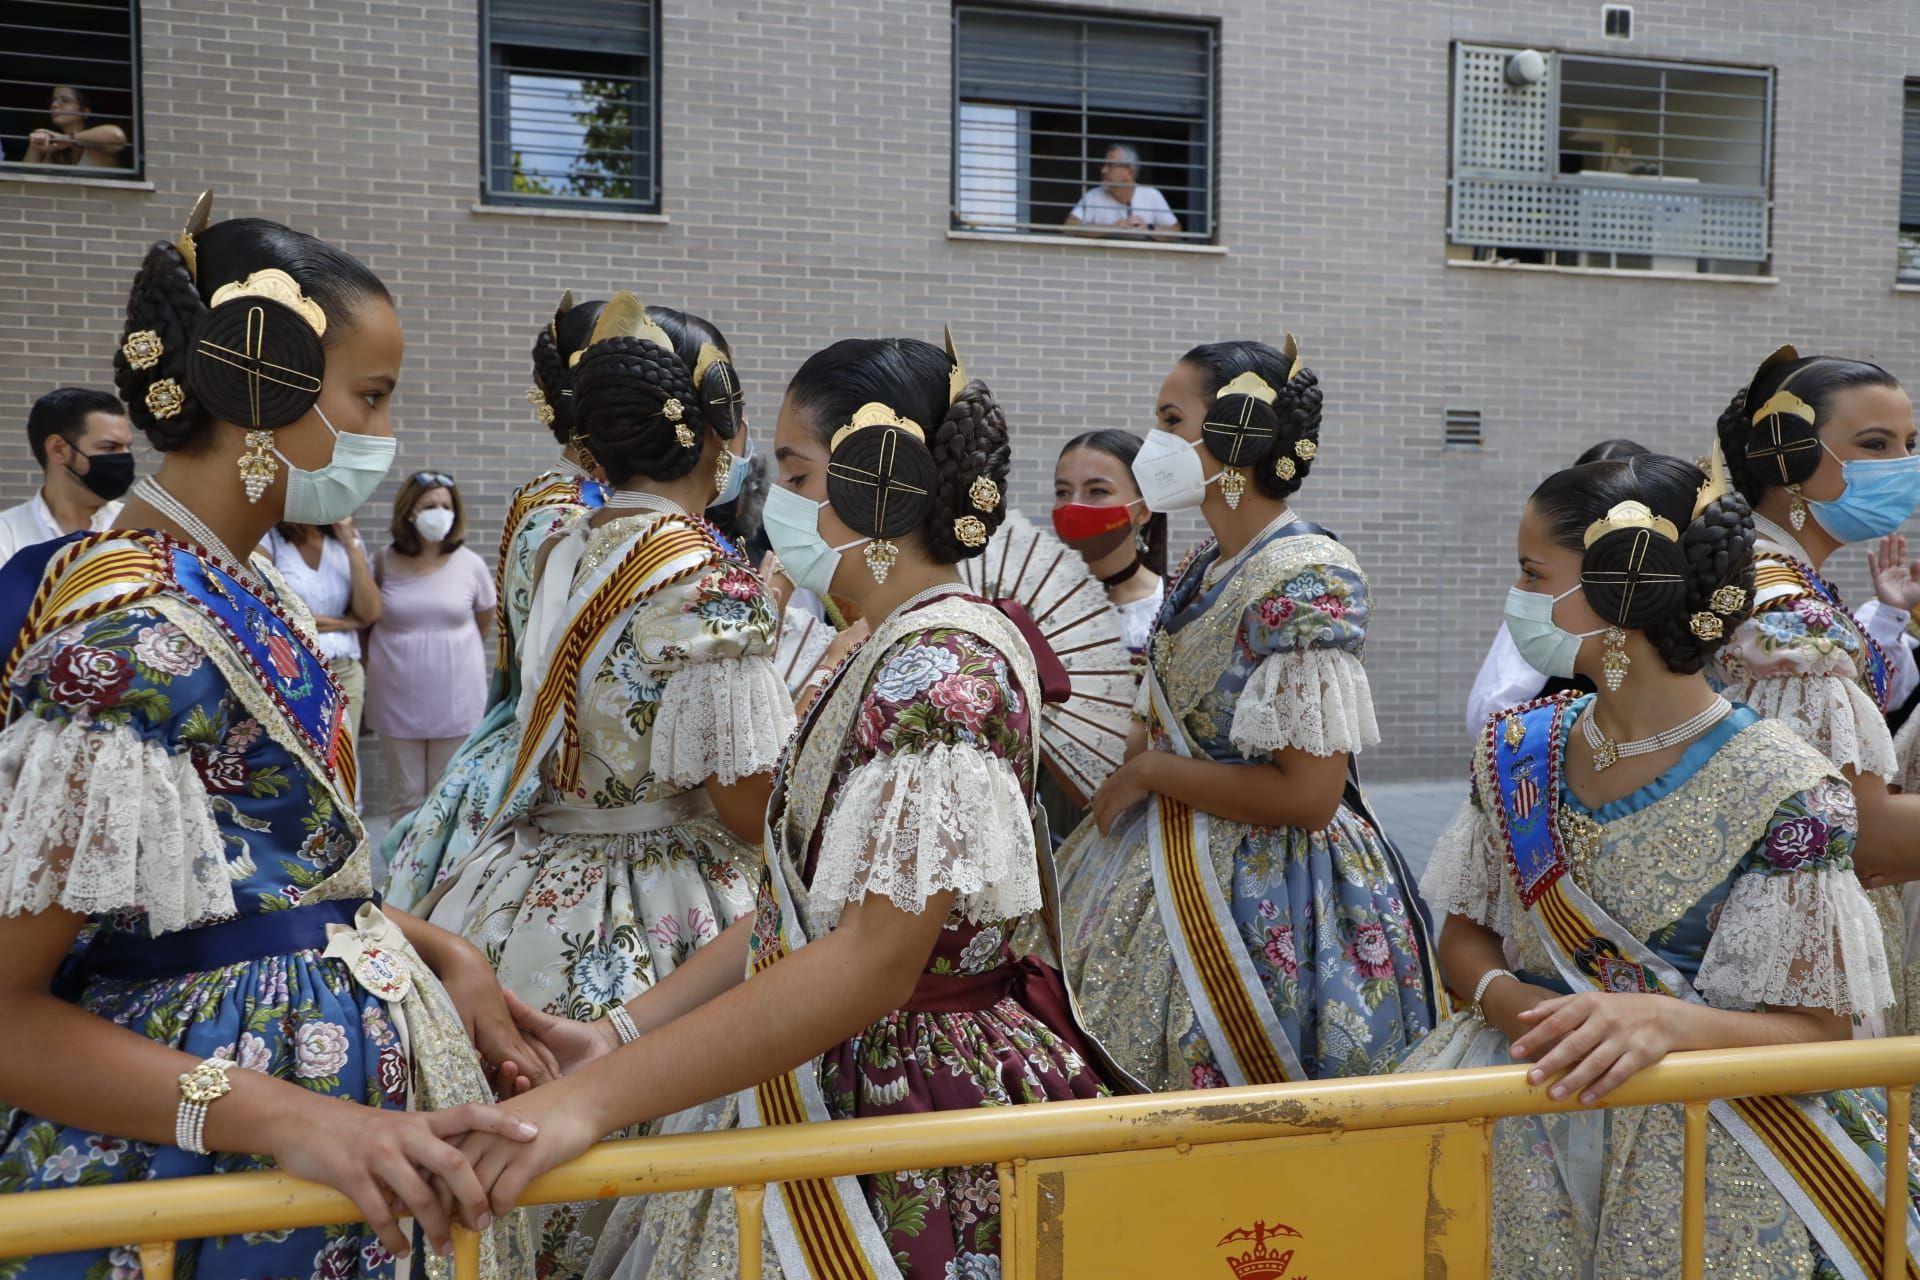 Vuelve a disfrutar de la 'mascletà' de hoy en Benicalap